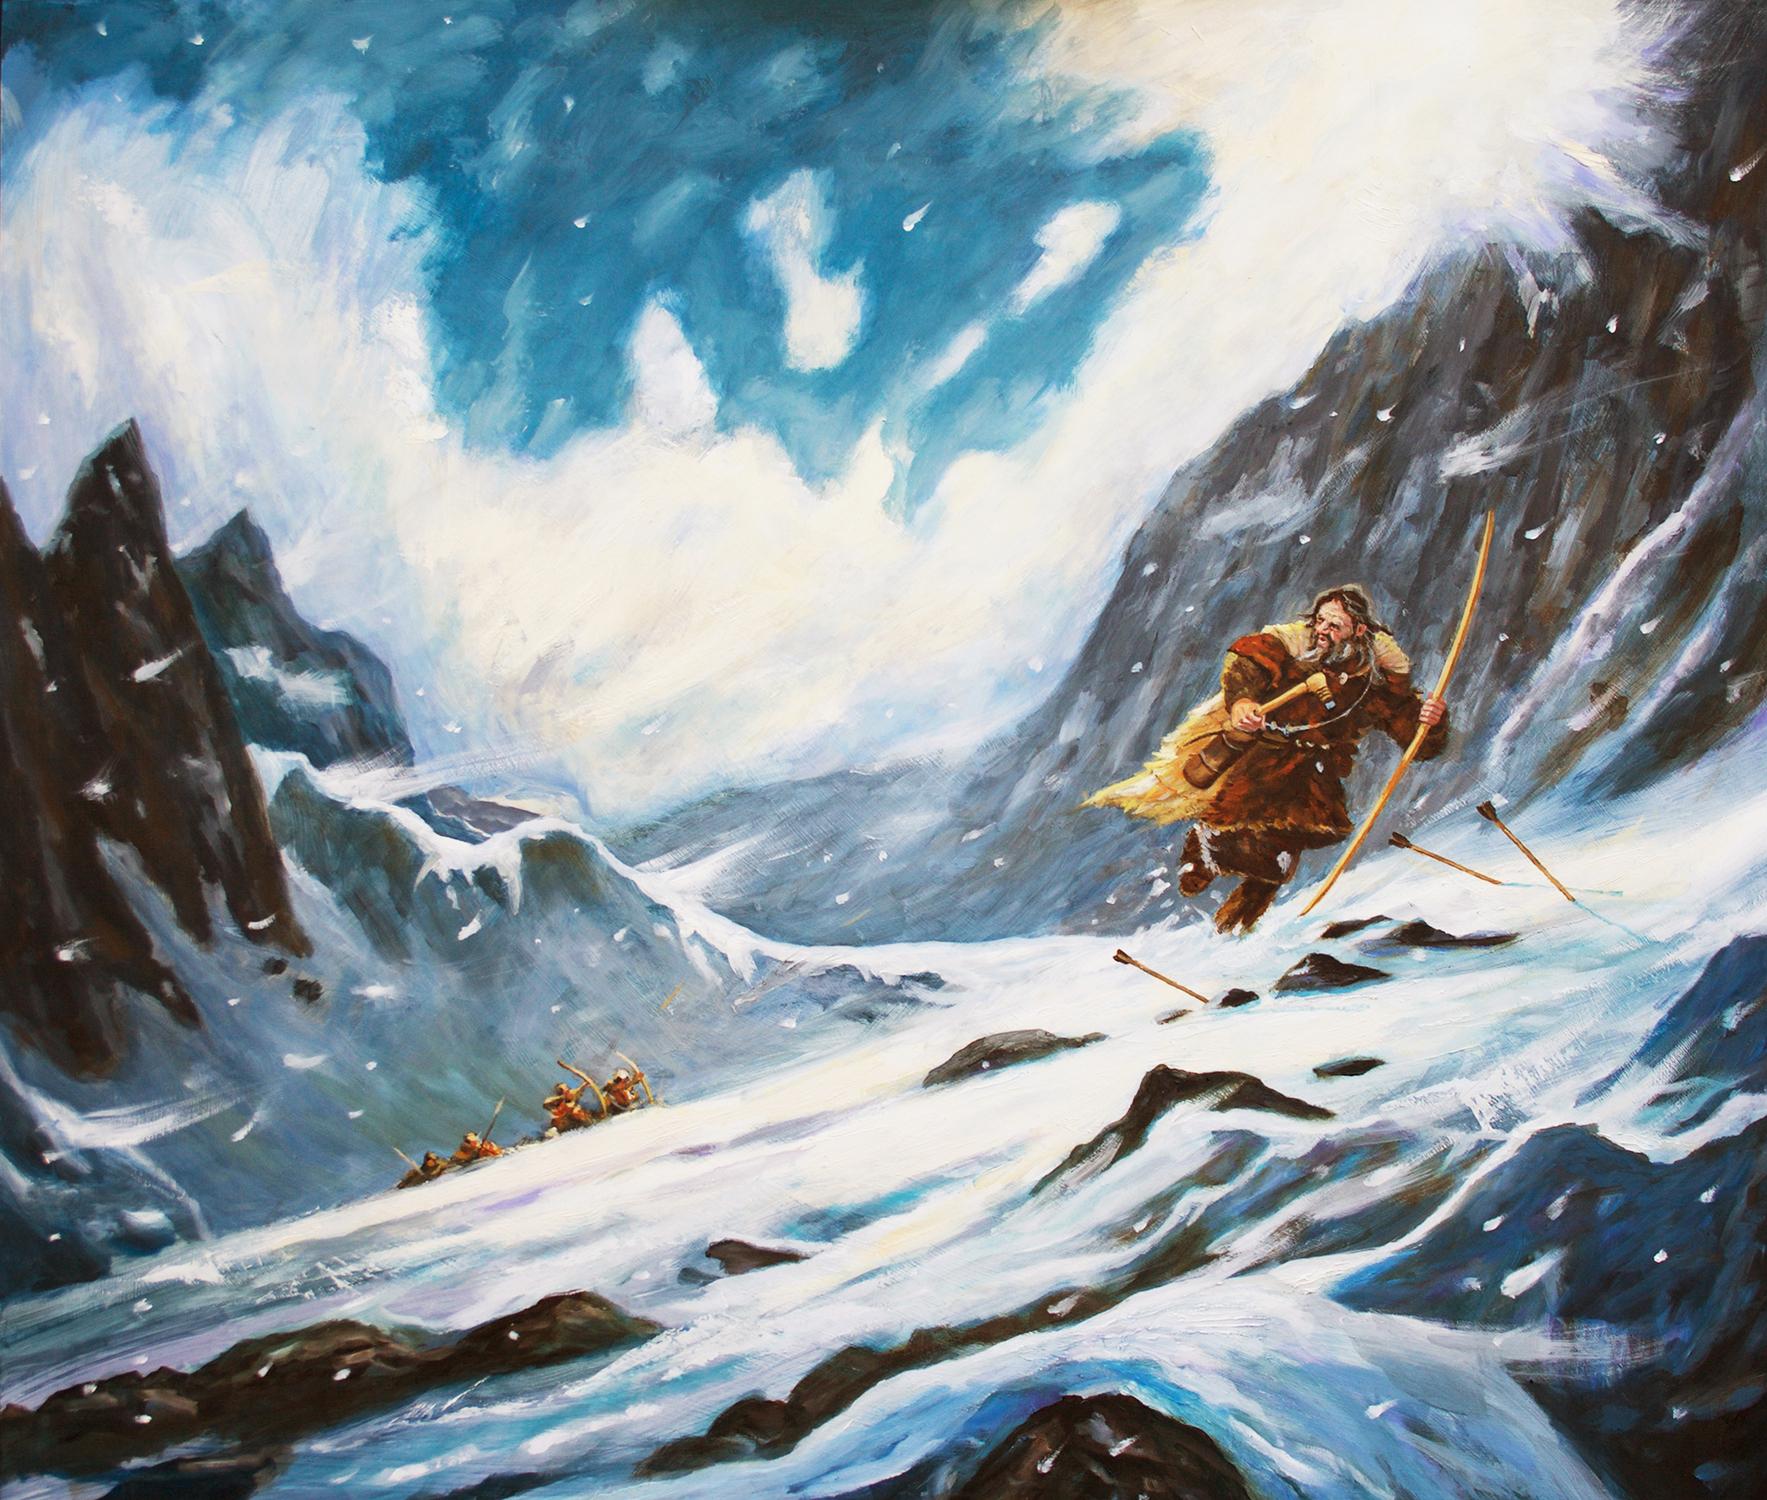 Otzi the Iceman Artwork by Brian McElligott